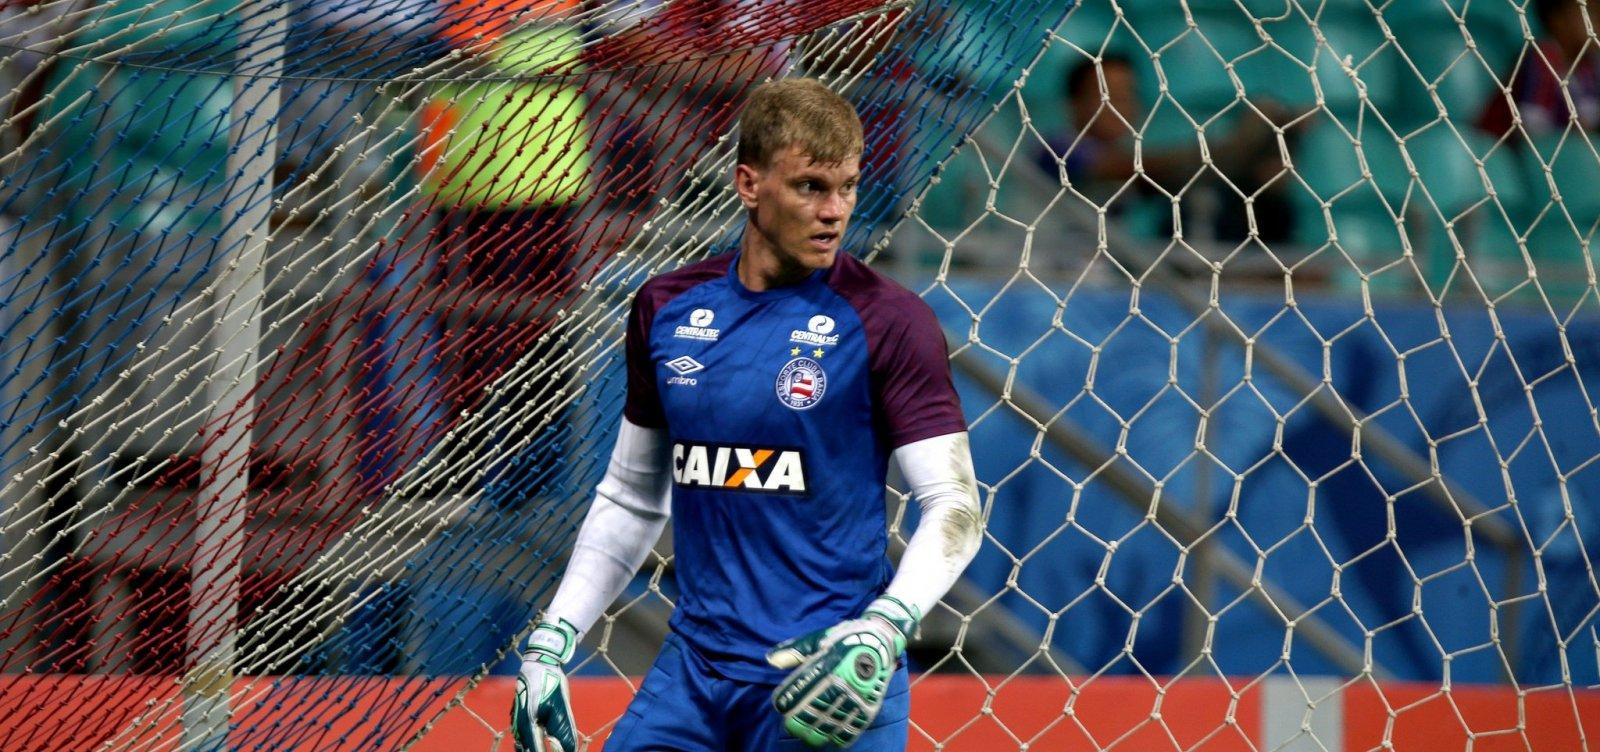 [Douglas exalta resultado positivo contra o Botafogo]